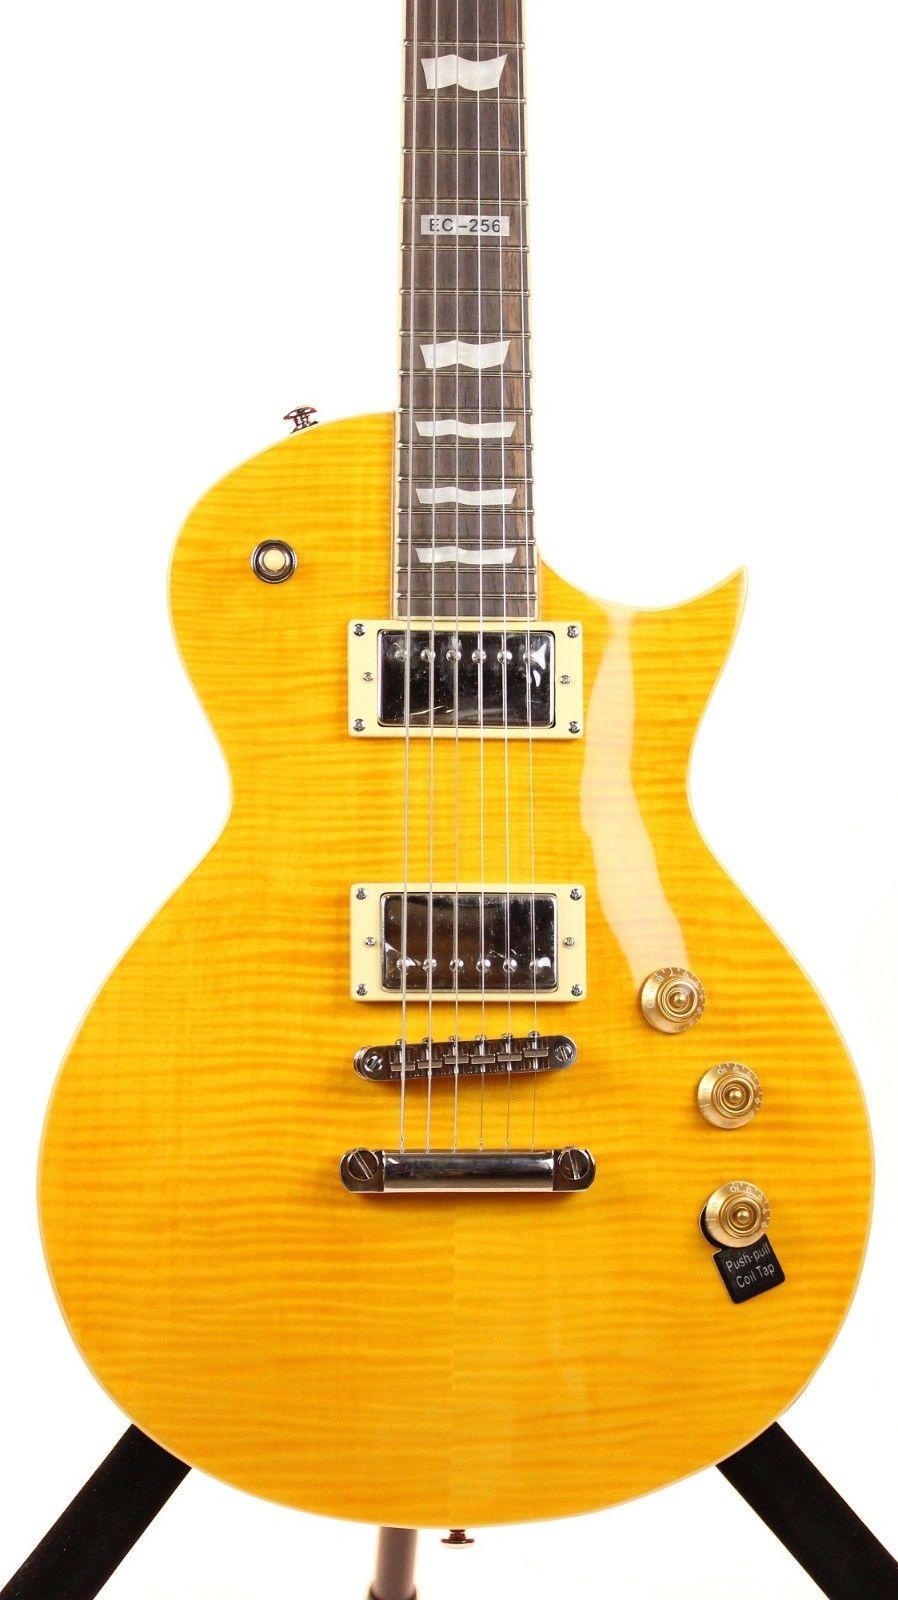 ESP LTD EC-256FM LD Distressed Electric Guitar Flame Maple Top with Lemon Drop Finish